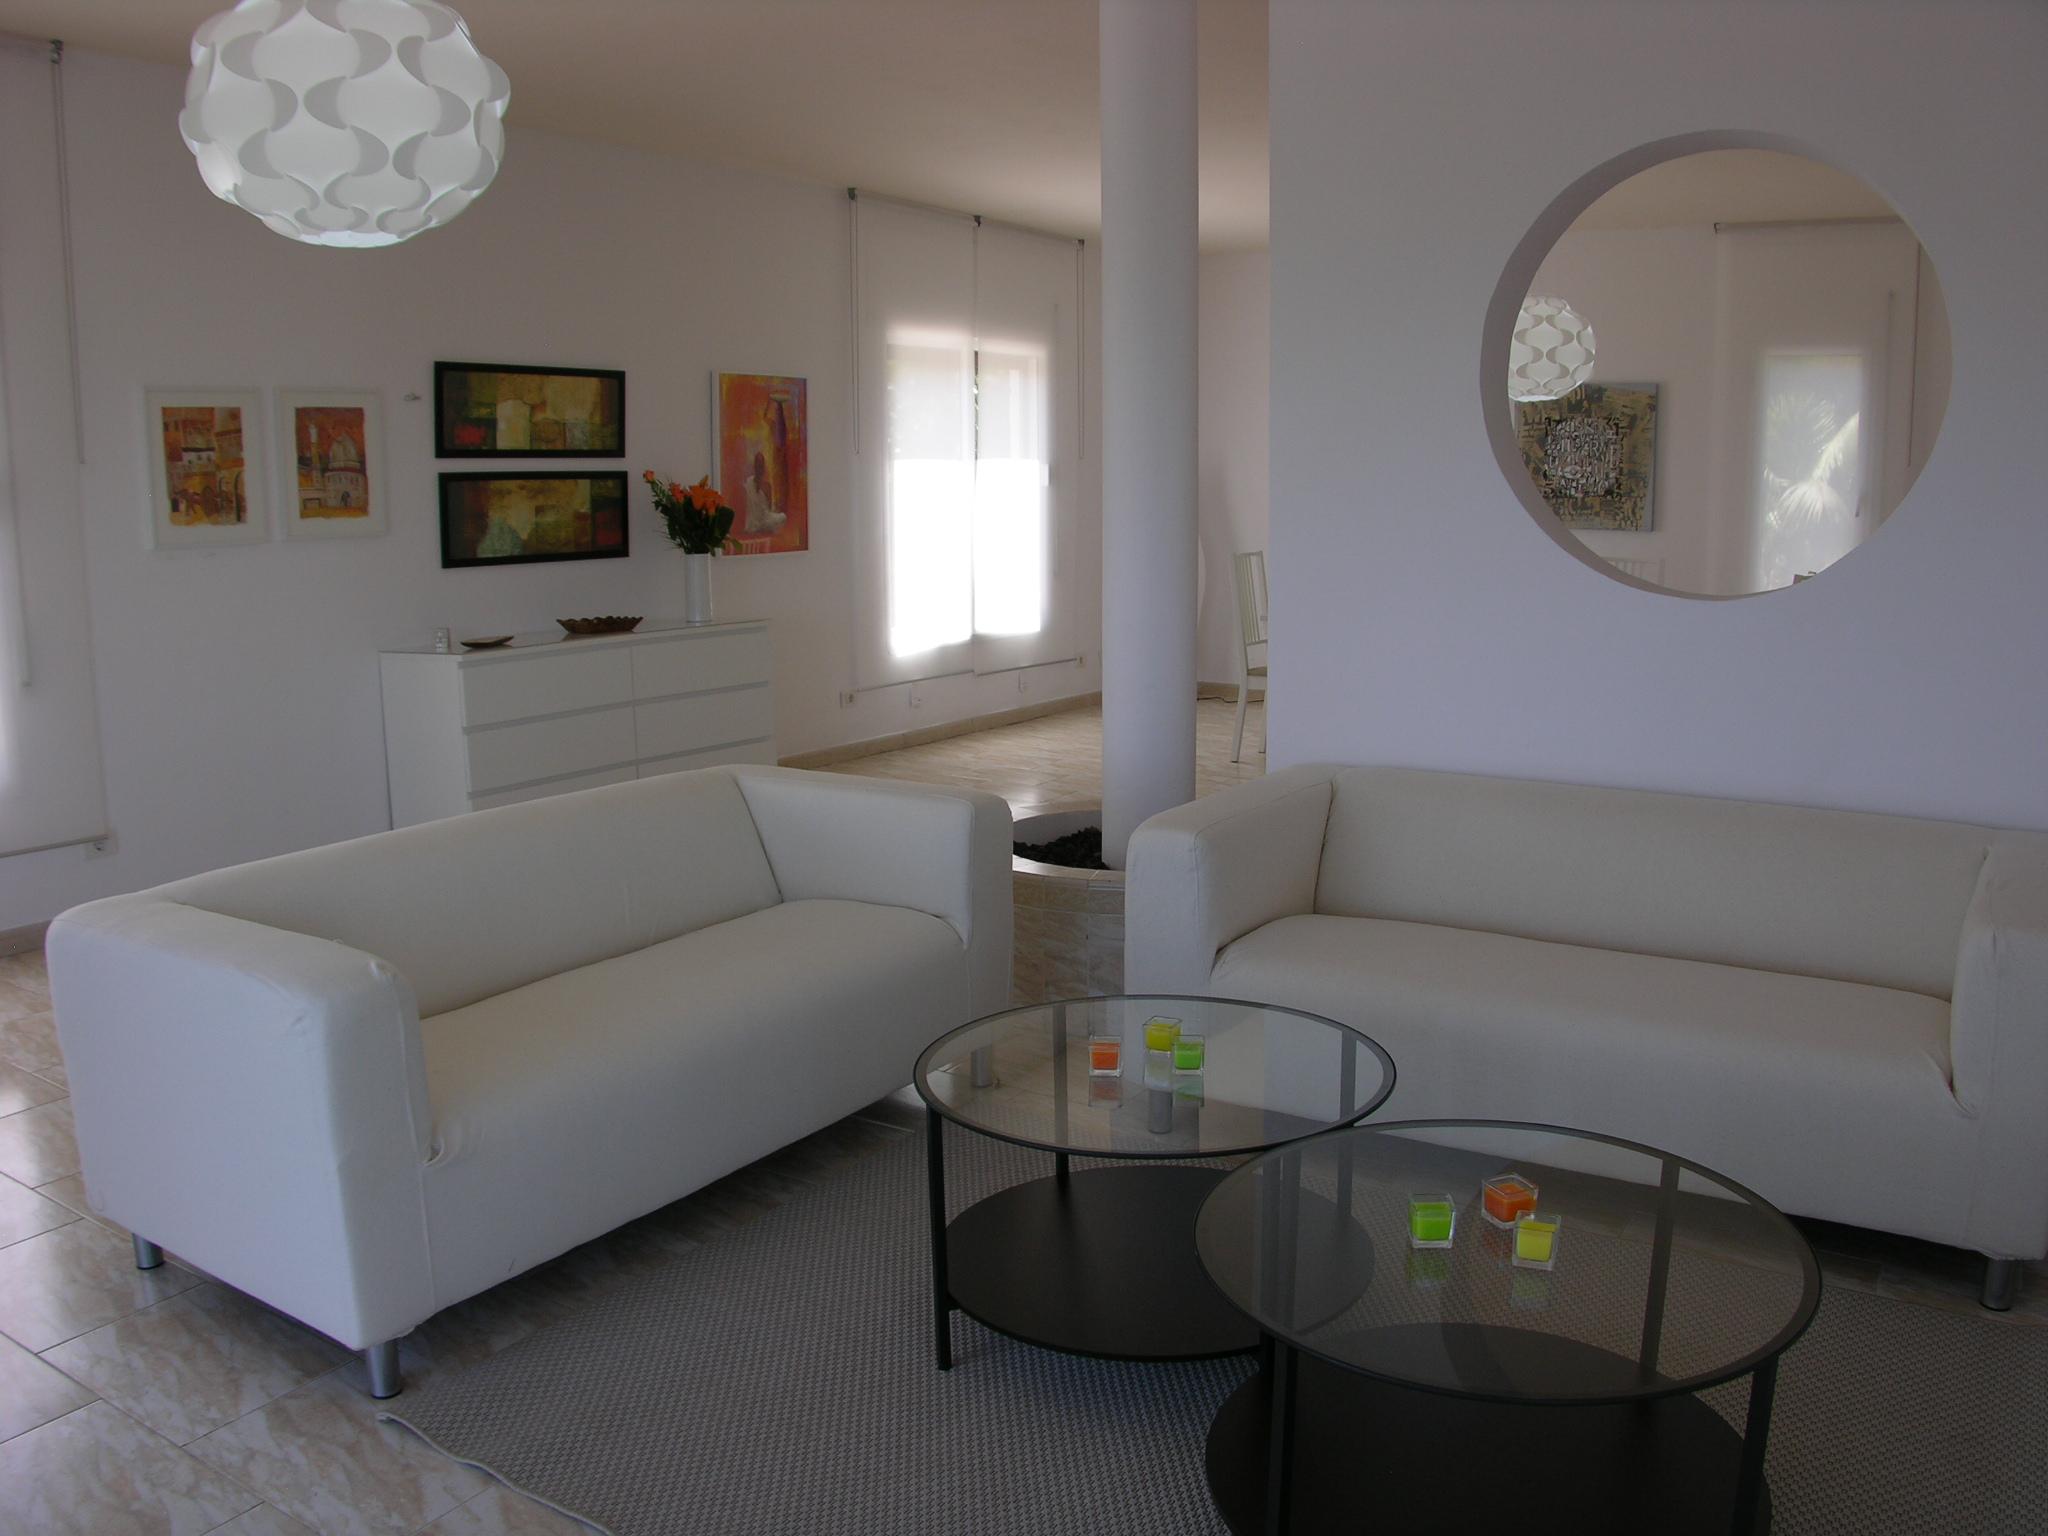 Maison de vacances Villa Vista La Quinta beheizbarer Pool kostenloses WLAN Grill (2124407), Santa Ursula, Ténérife, Iles Canaries, Espagne, image 44